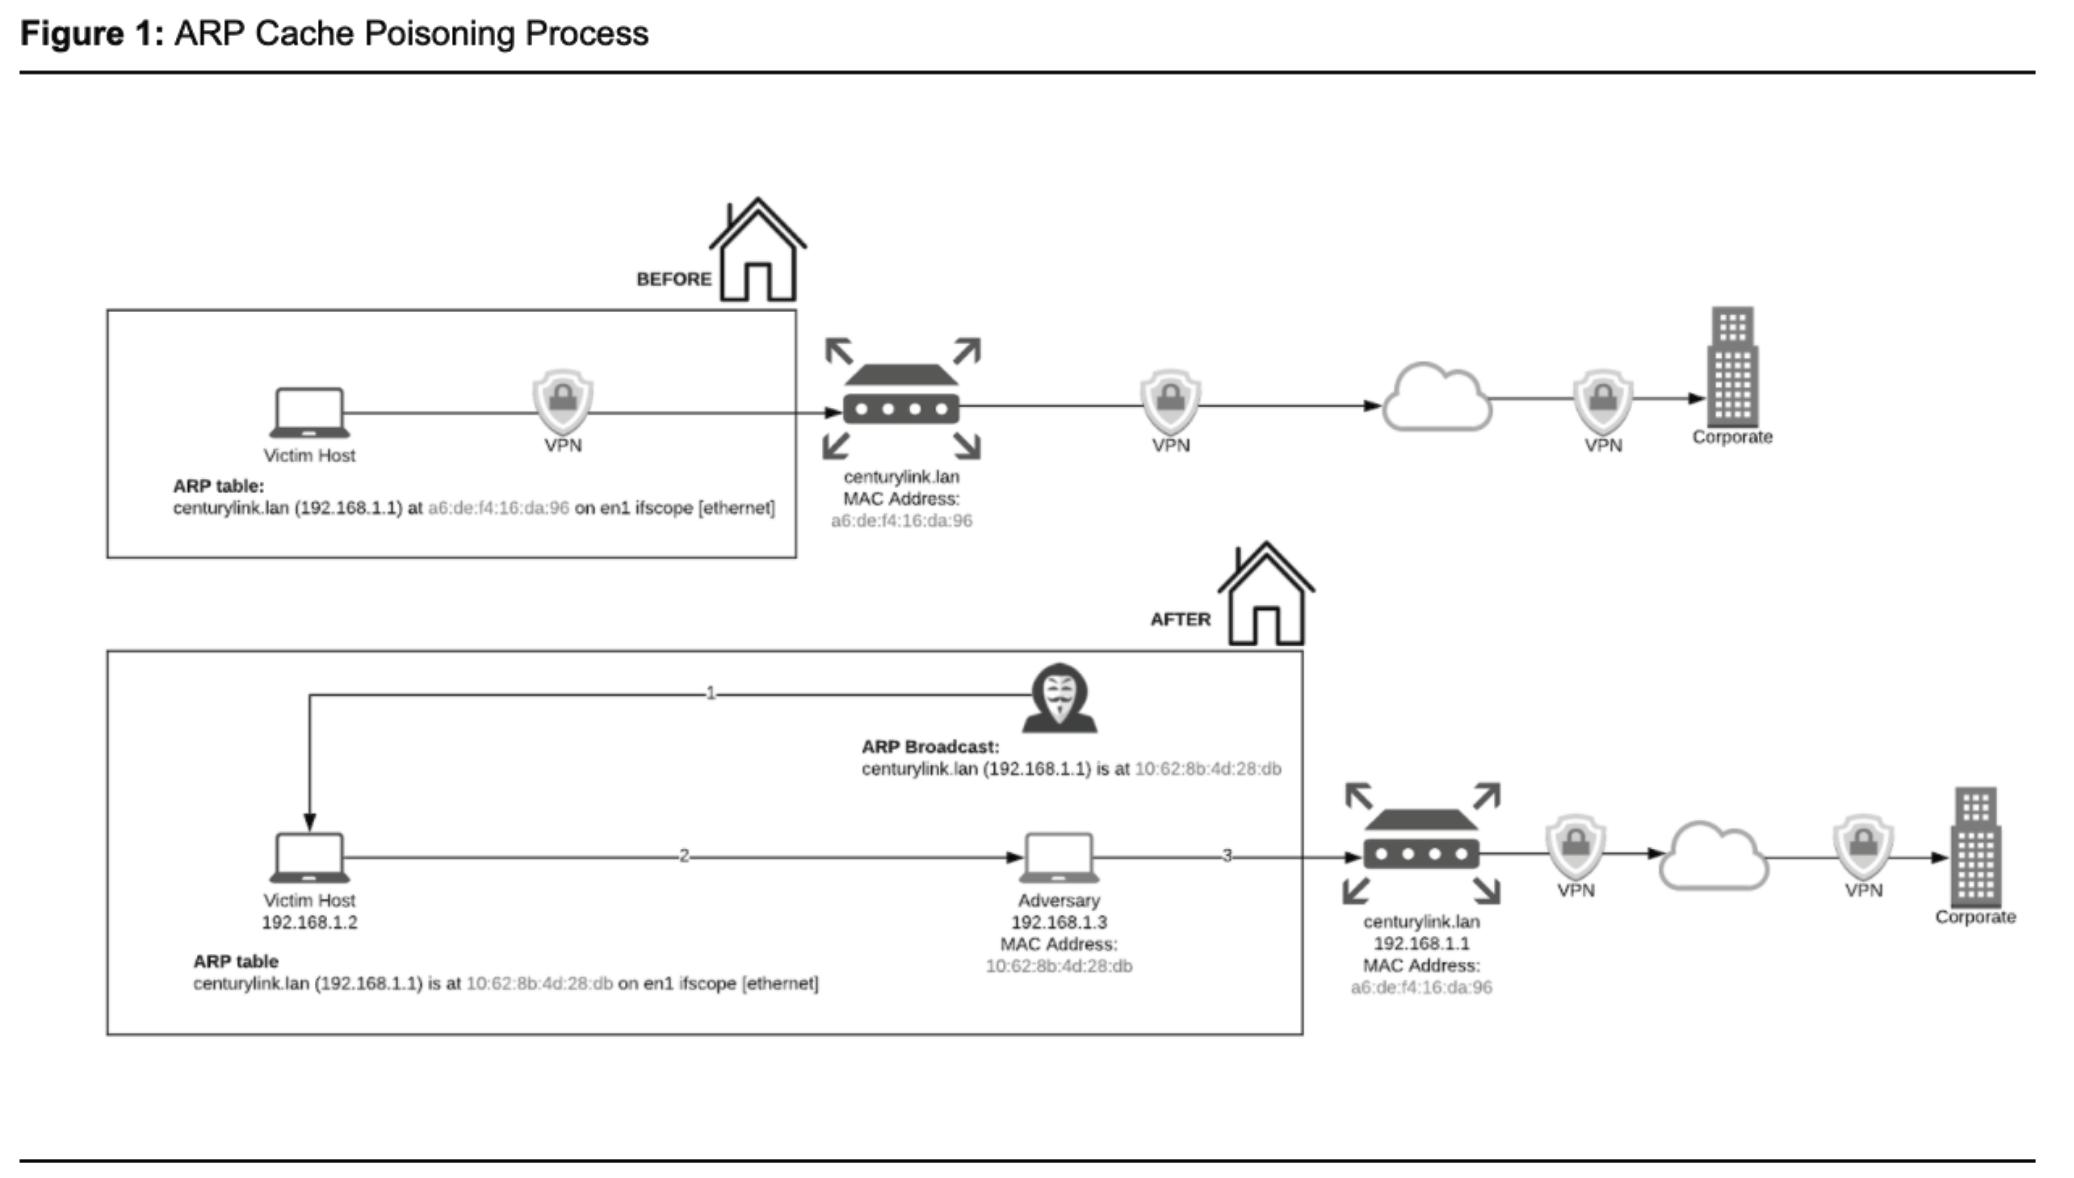 ARP Cache Poisoning Process